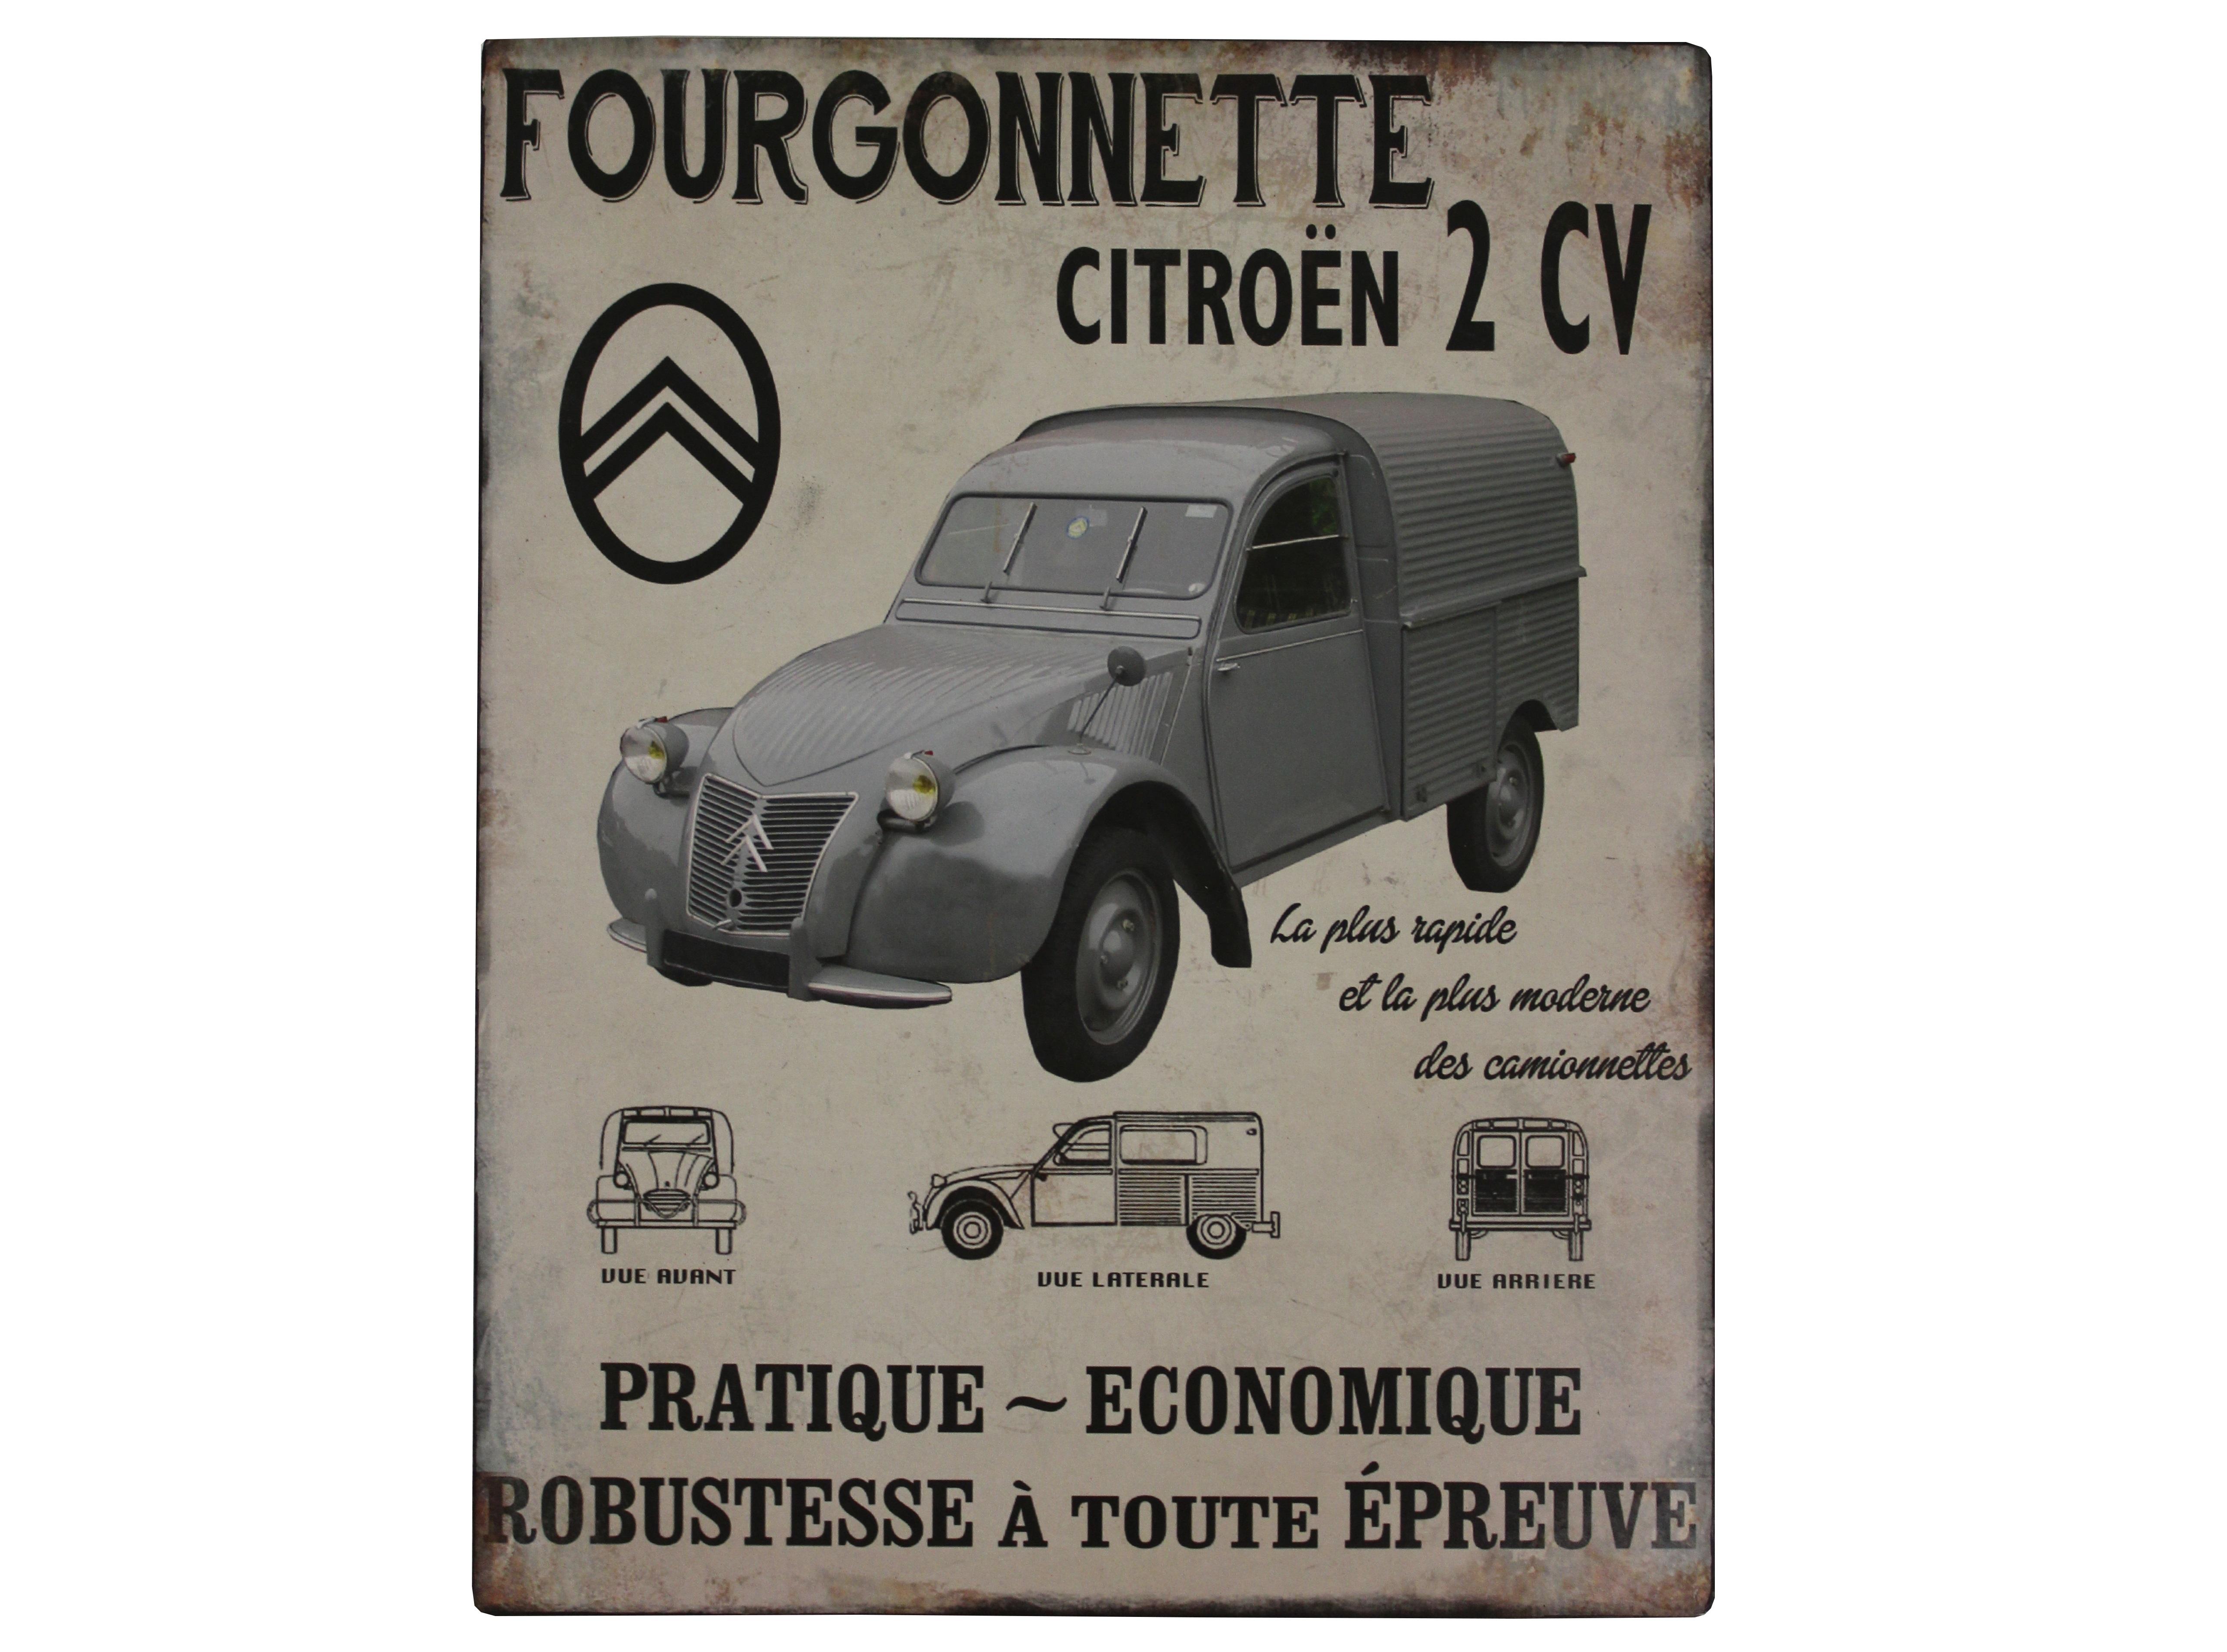 Табличка FourgonnetteДругое<br>Материал: Железо, Бумага<br><br>Material: Железо<br>Length см: None<br>Width см: 24.2<br>Depth см: 3<br>Height см: 30.8